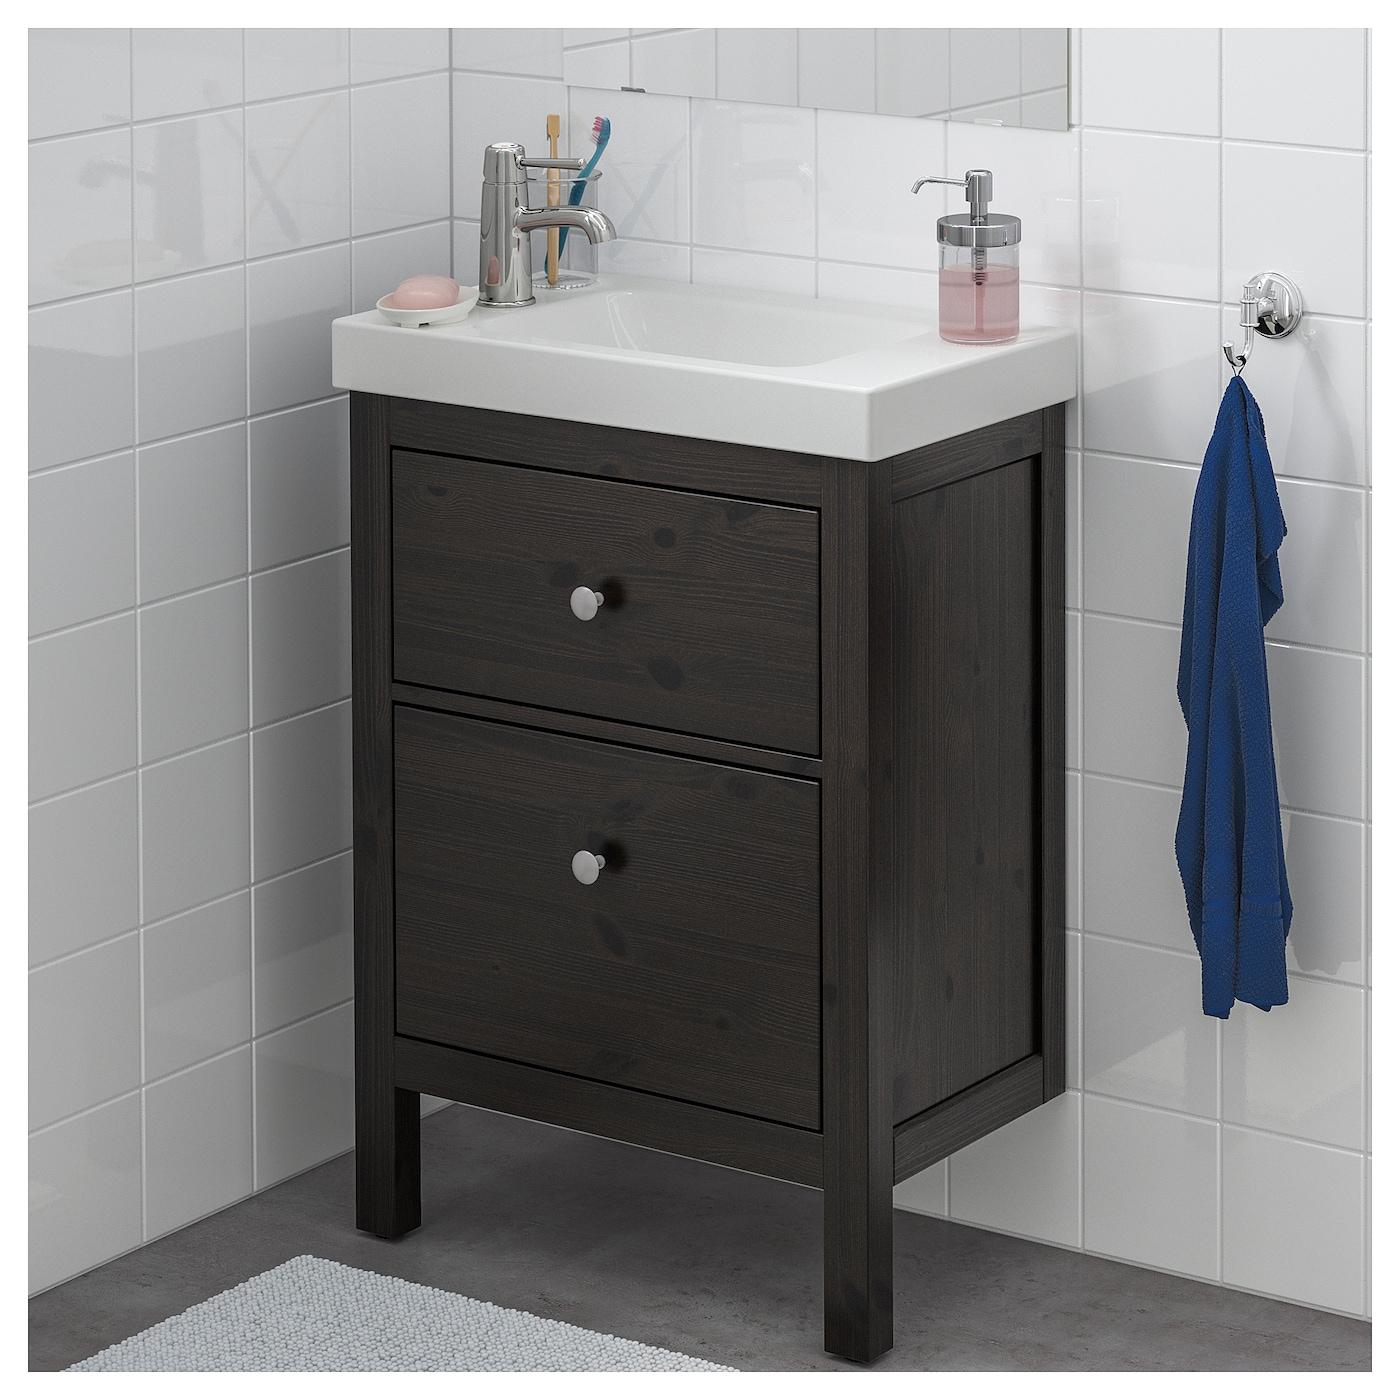 HEMNES HAGAVIKEN Wash stand with 2 drawers Black brown 60x34x90 cm IKEA